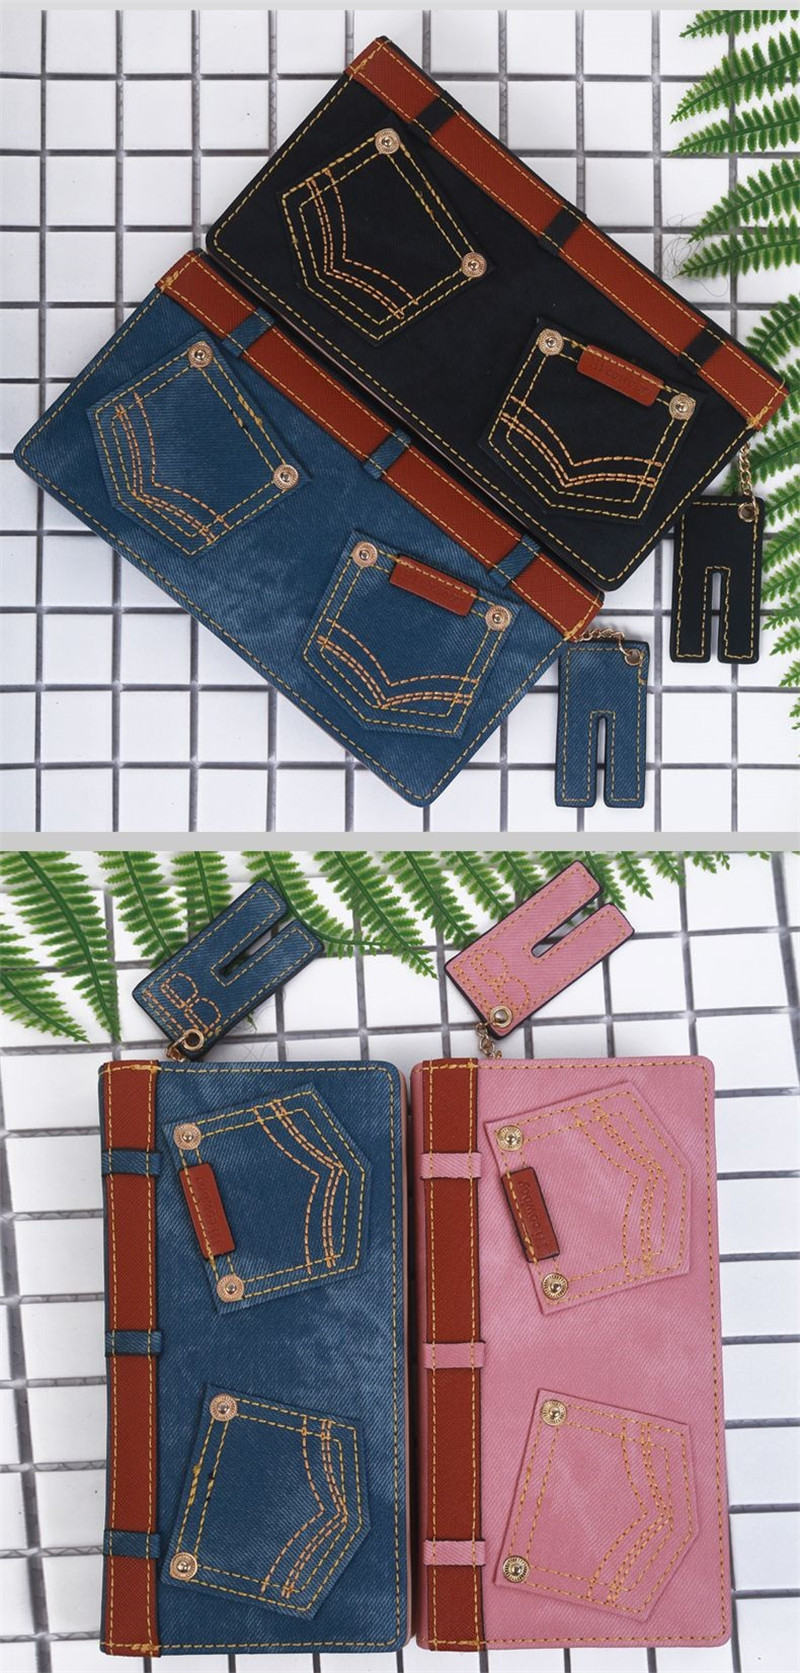 fino mulheres carteiras cartões titulares coin purse